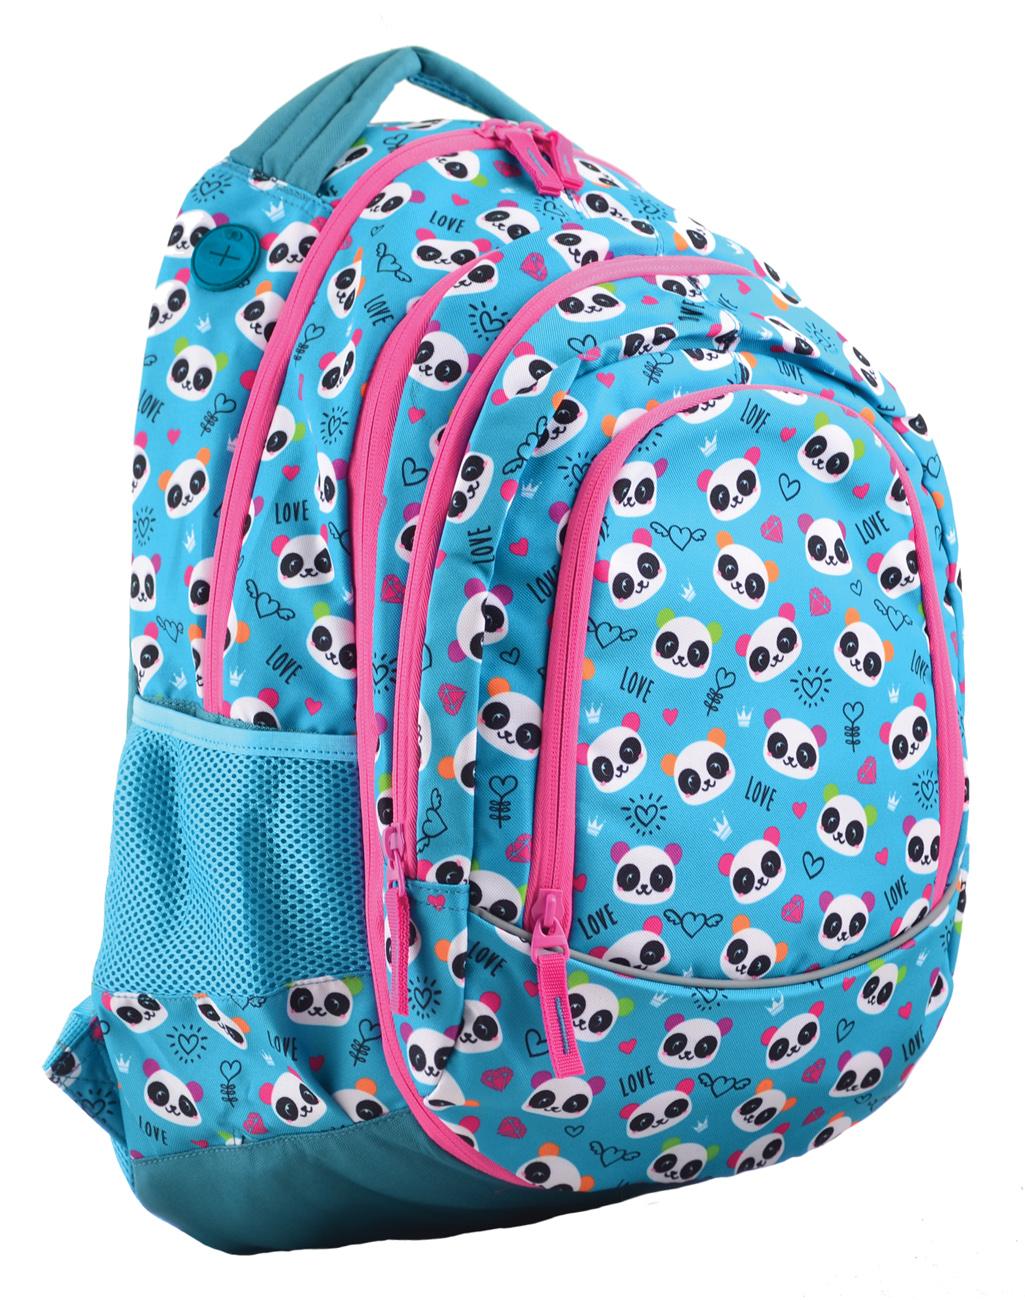 Рюкзак молодежный 2в1 Т-40 Lovely panda, 49*32*15.5